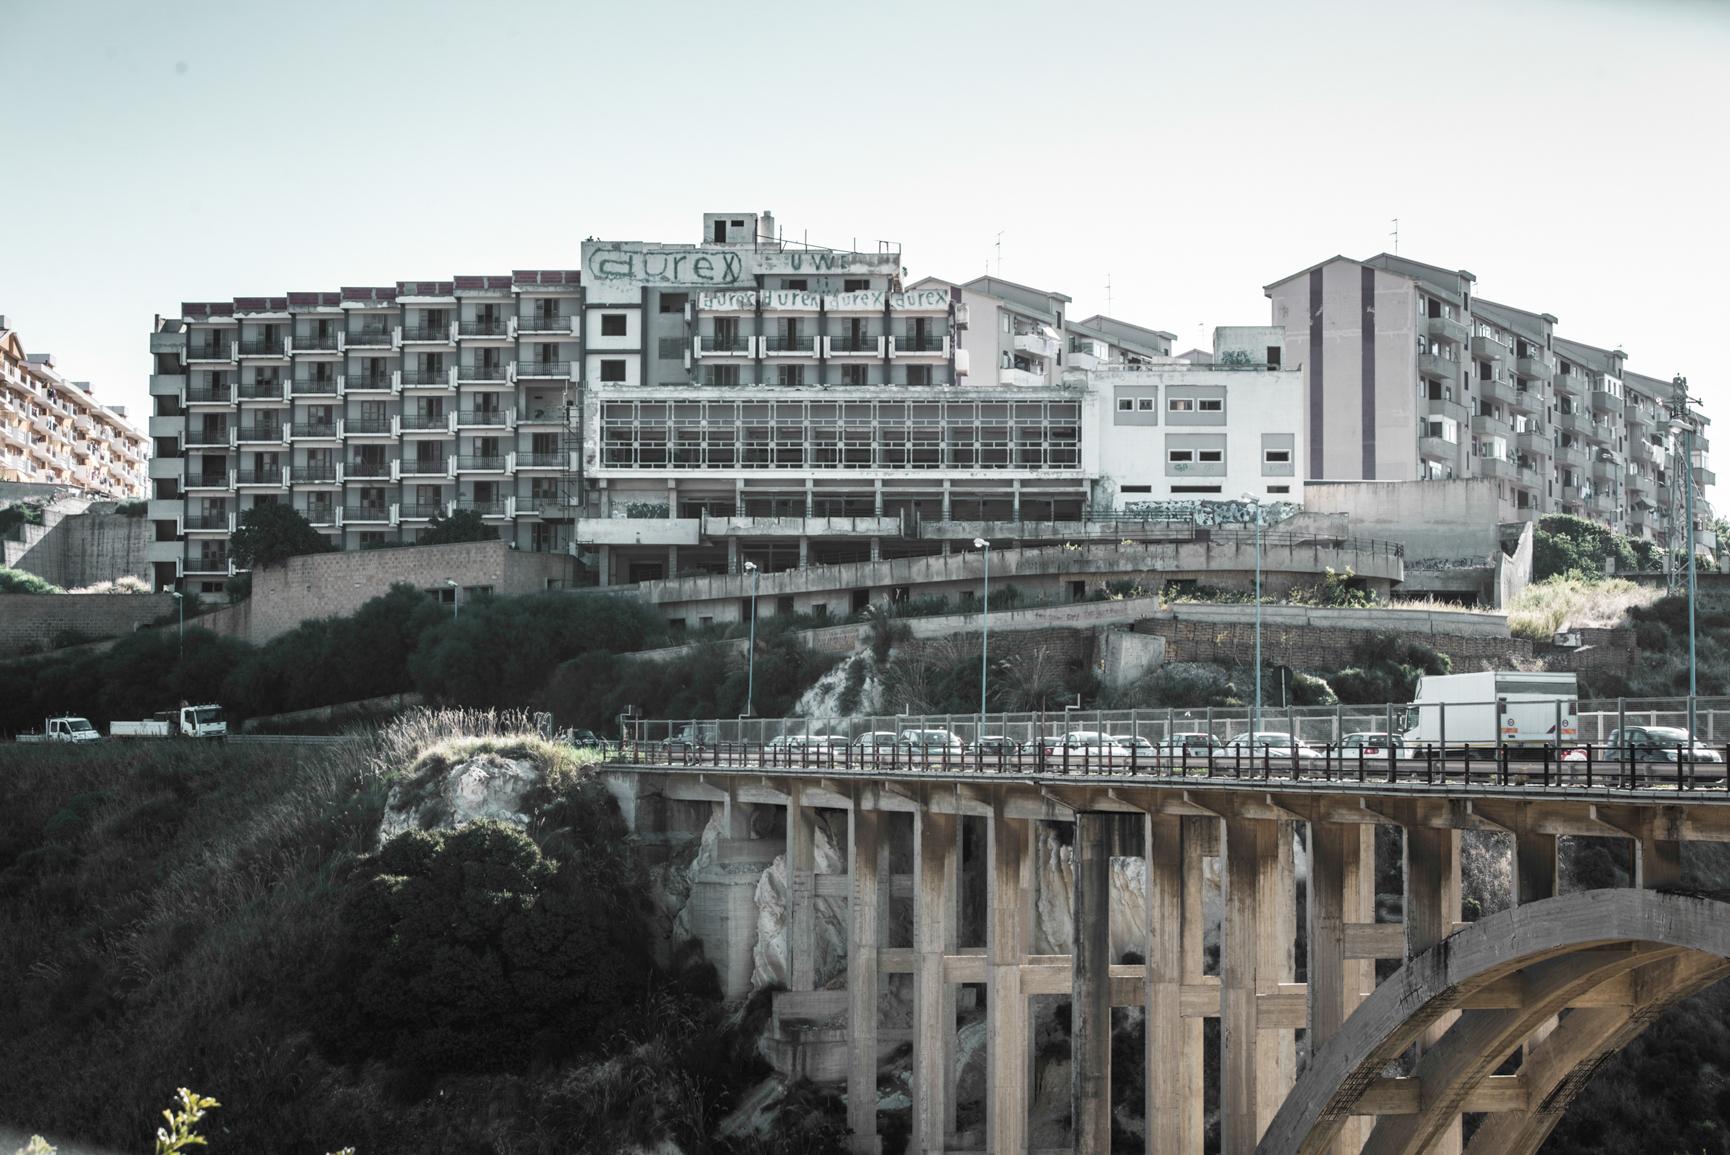 portoempedocle (agrigento) Hotel africa (5).jpg